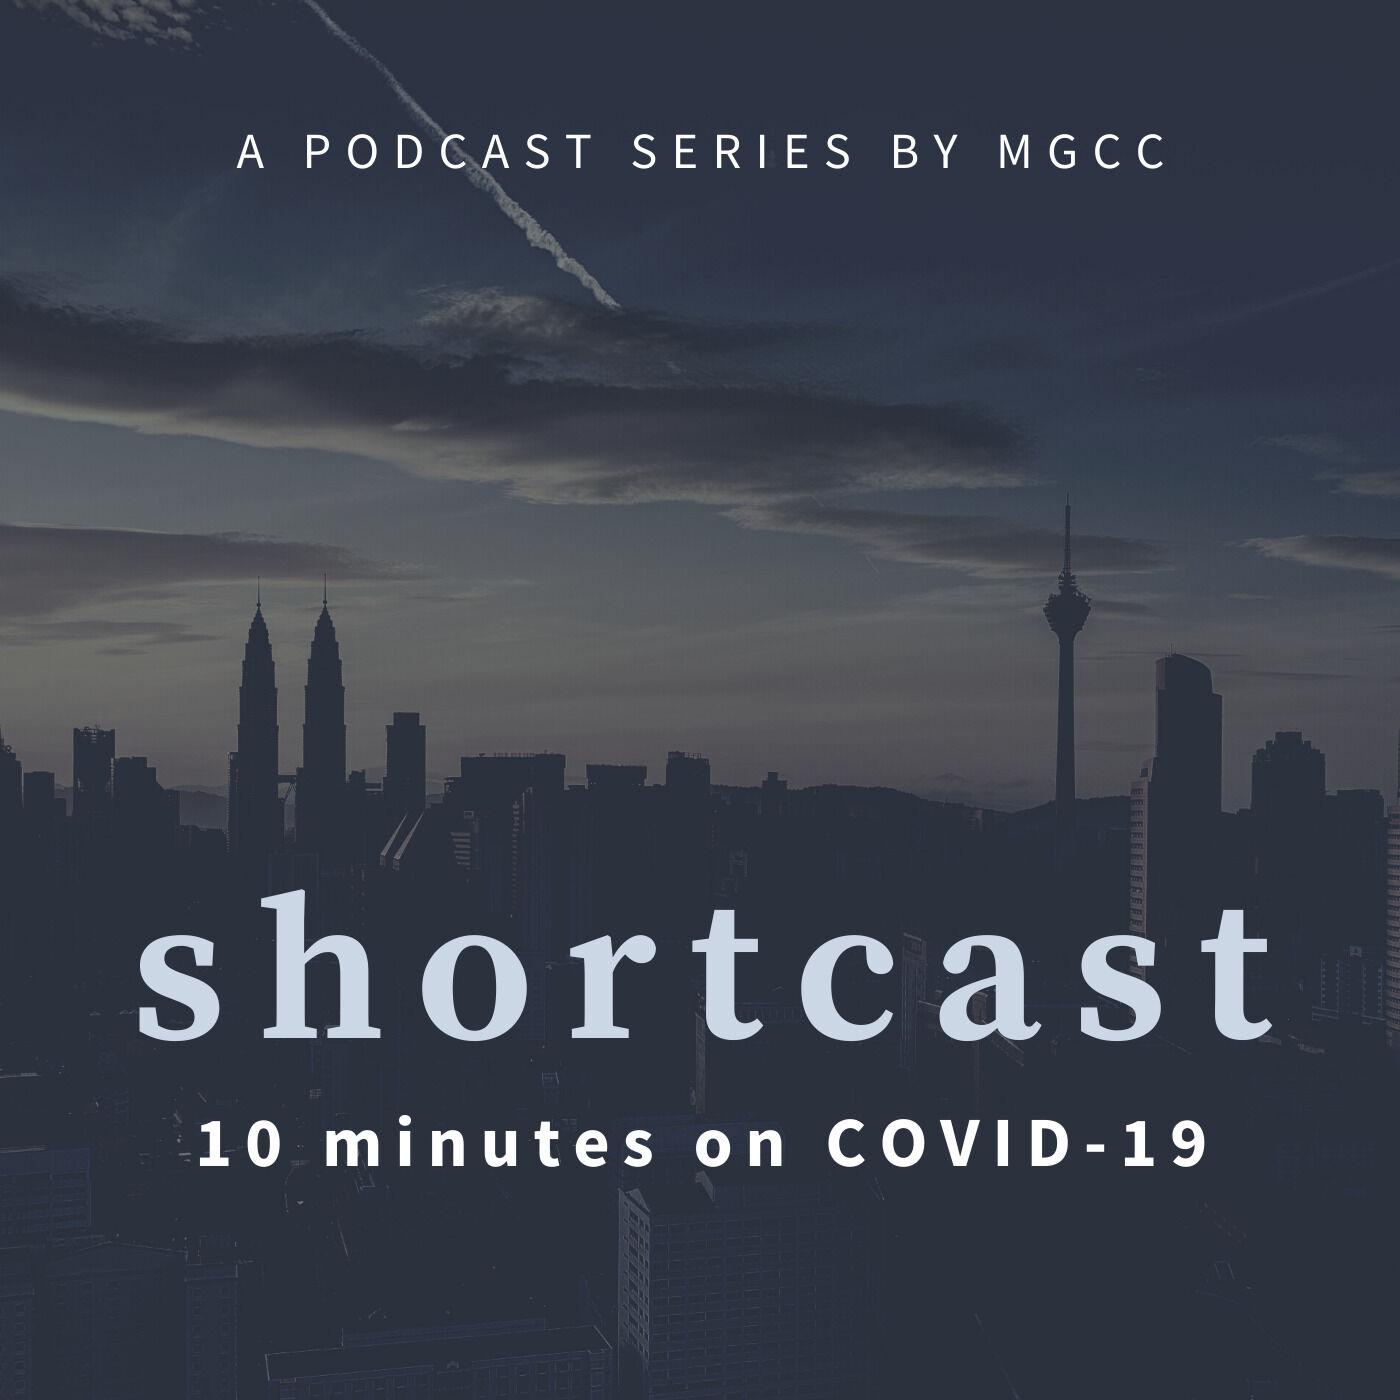 Shortcast #004: Dr. Claus Weidner (Mercedes-Benz Malaysia)